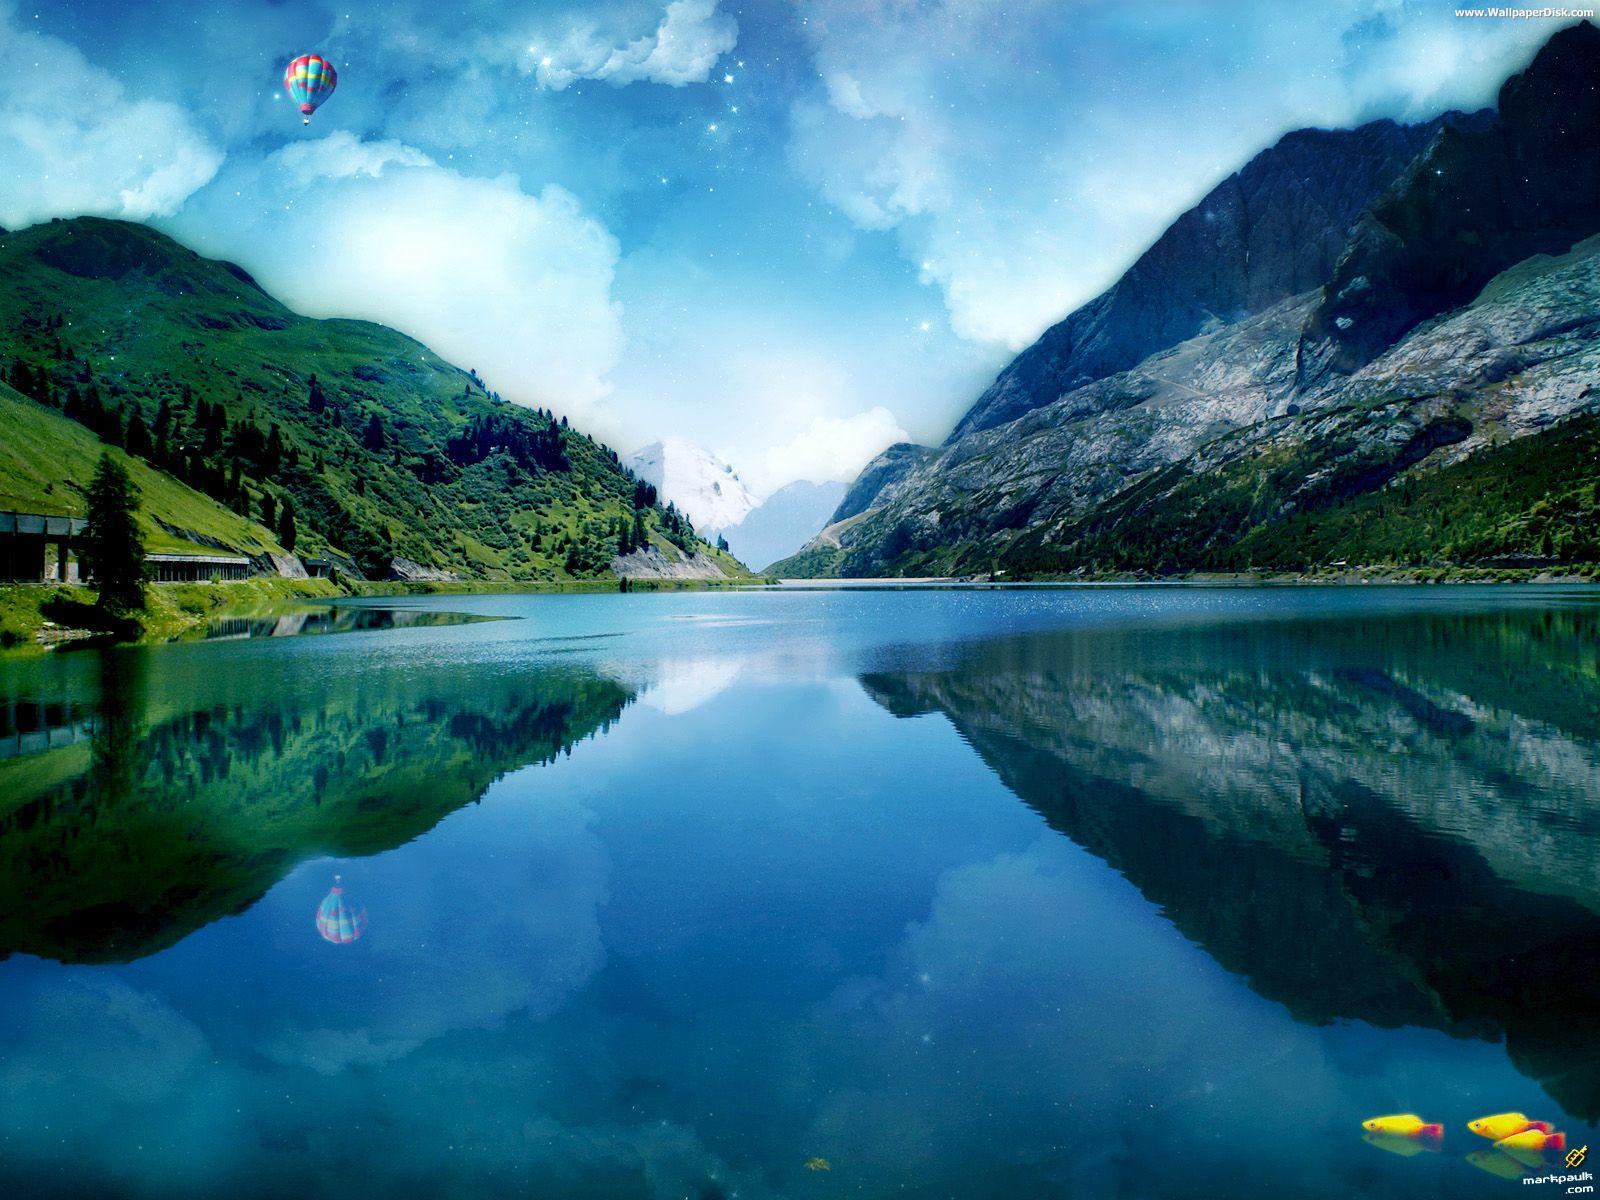 Beautiful Lake Wallpaper Viewing Gallery 1600x1200px